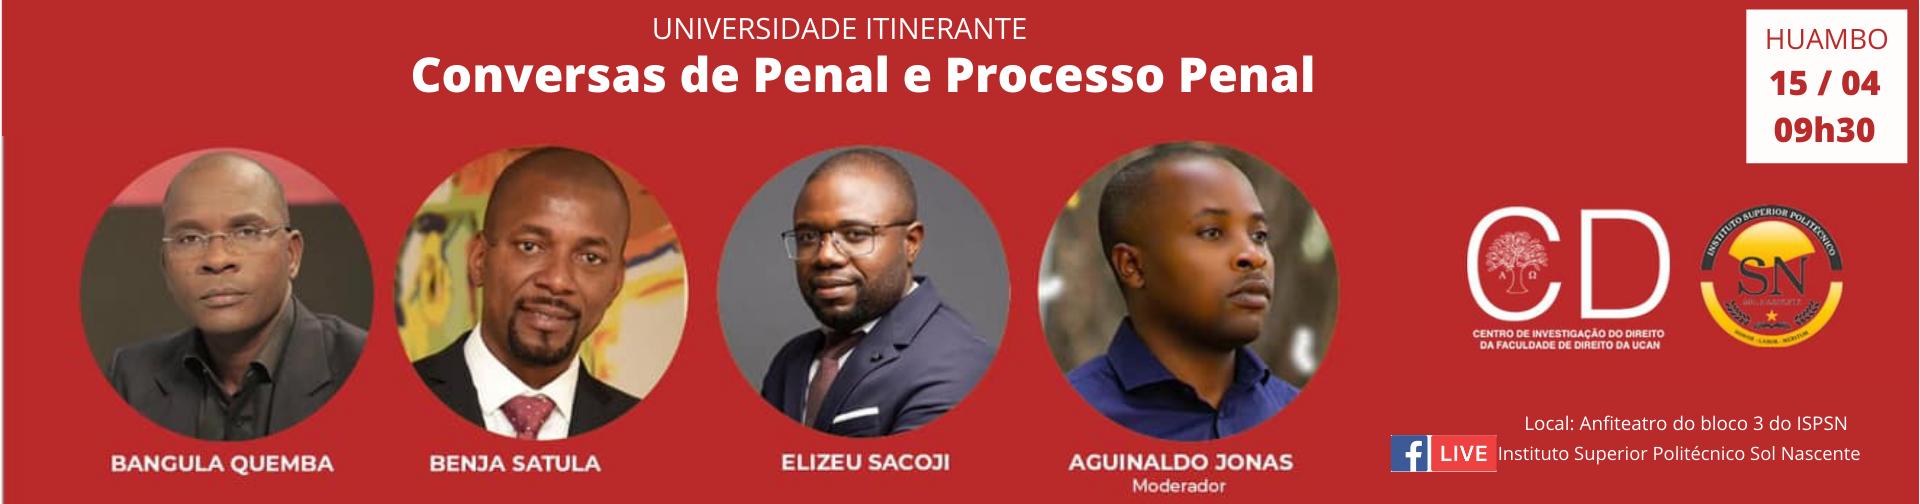 CONVERSAS DE PENAL E PROCESSO PENAL